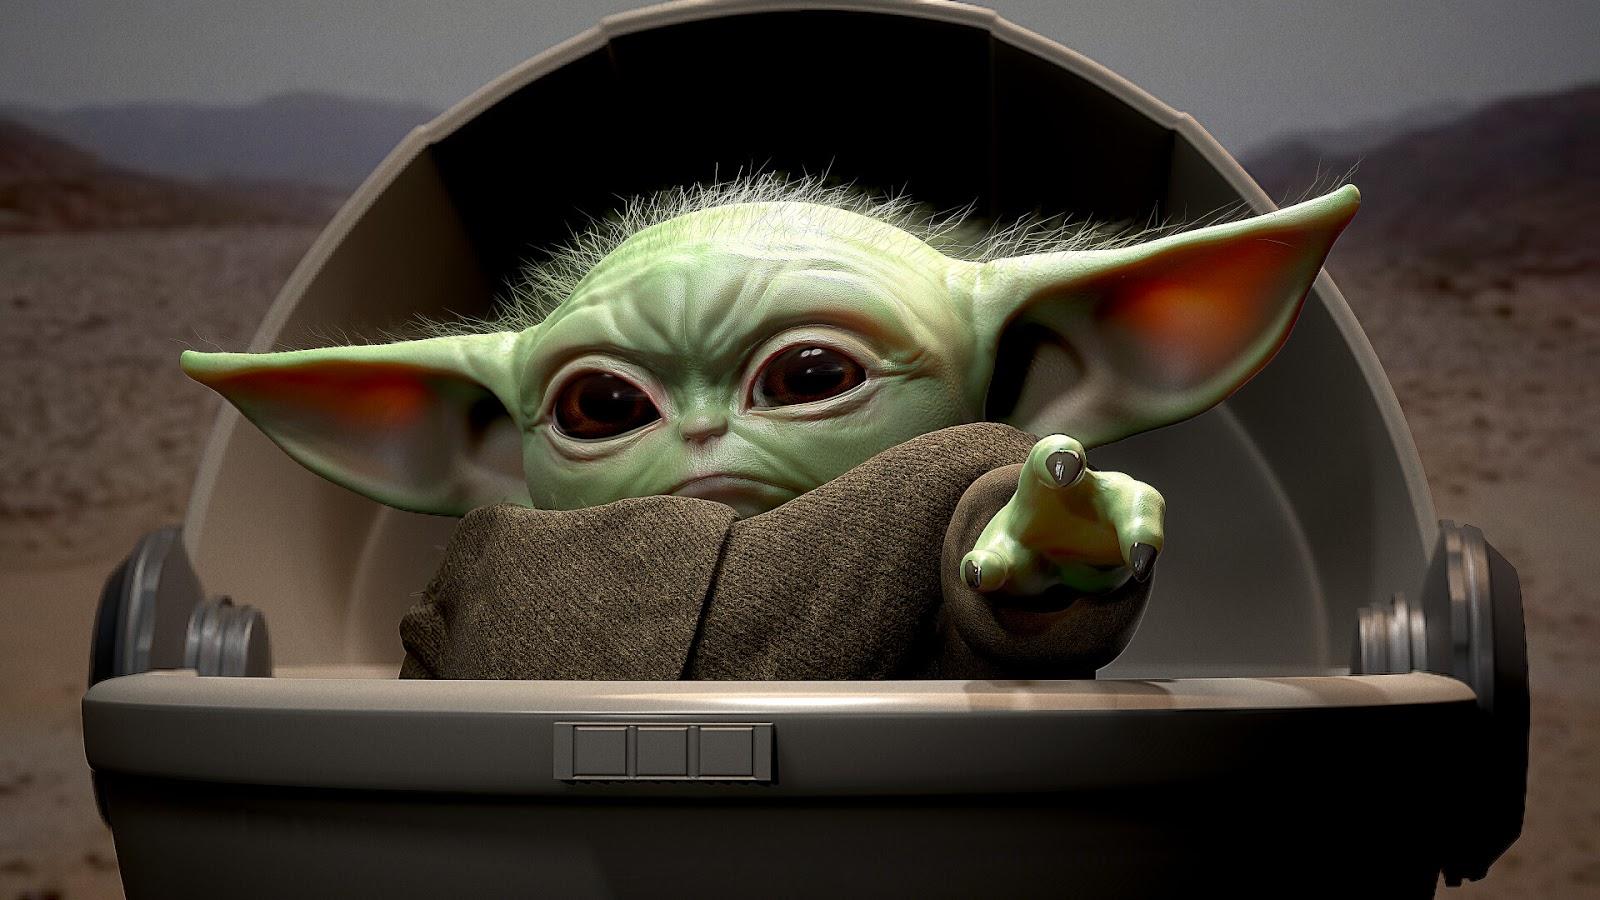 Desktop Wallpaper Baby Yoda Heroscreen Cool Wallpapers